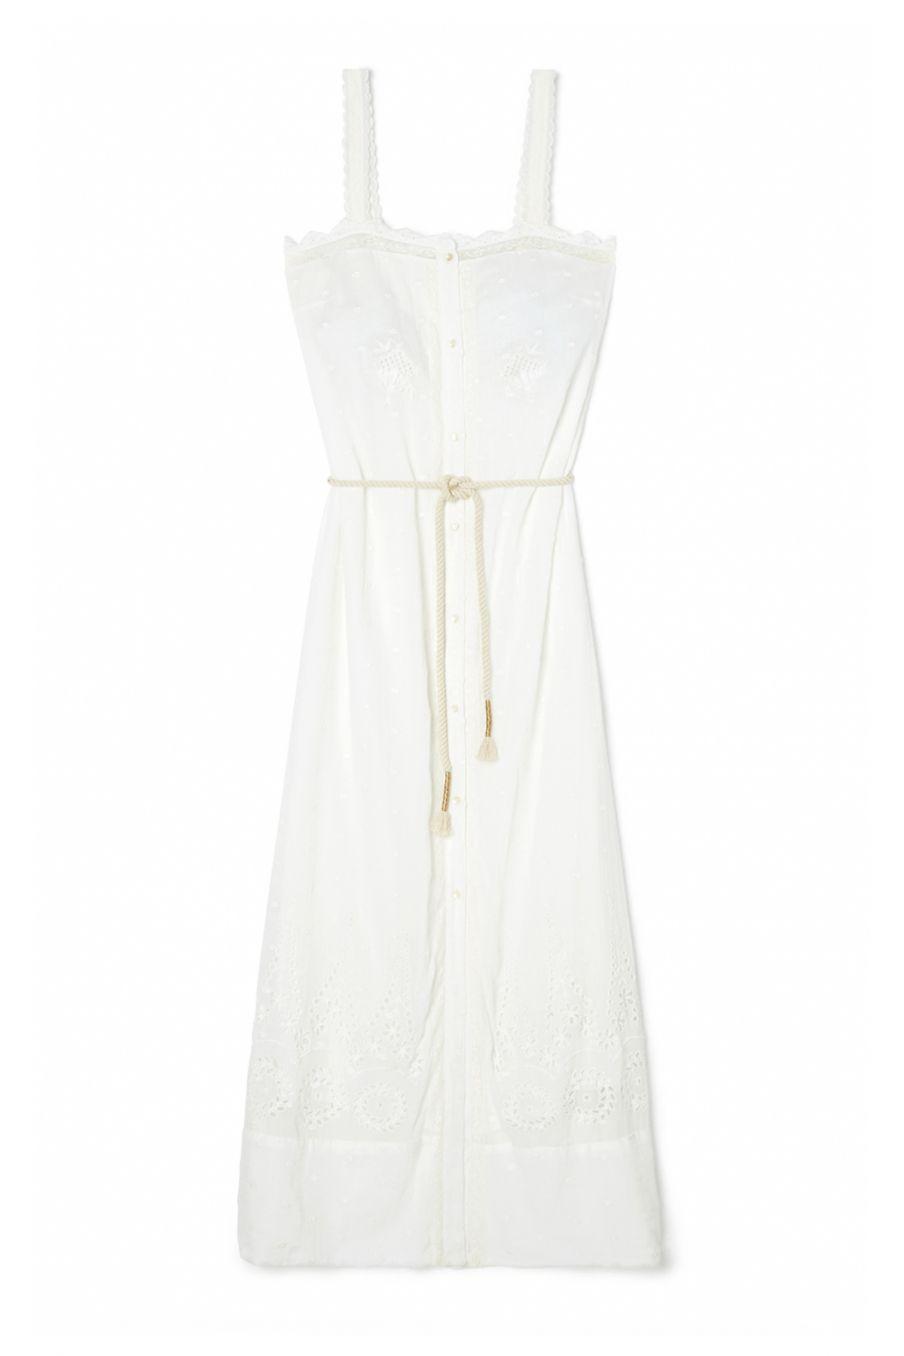 boheme chic vintage robe femme guananina off-white plumetis